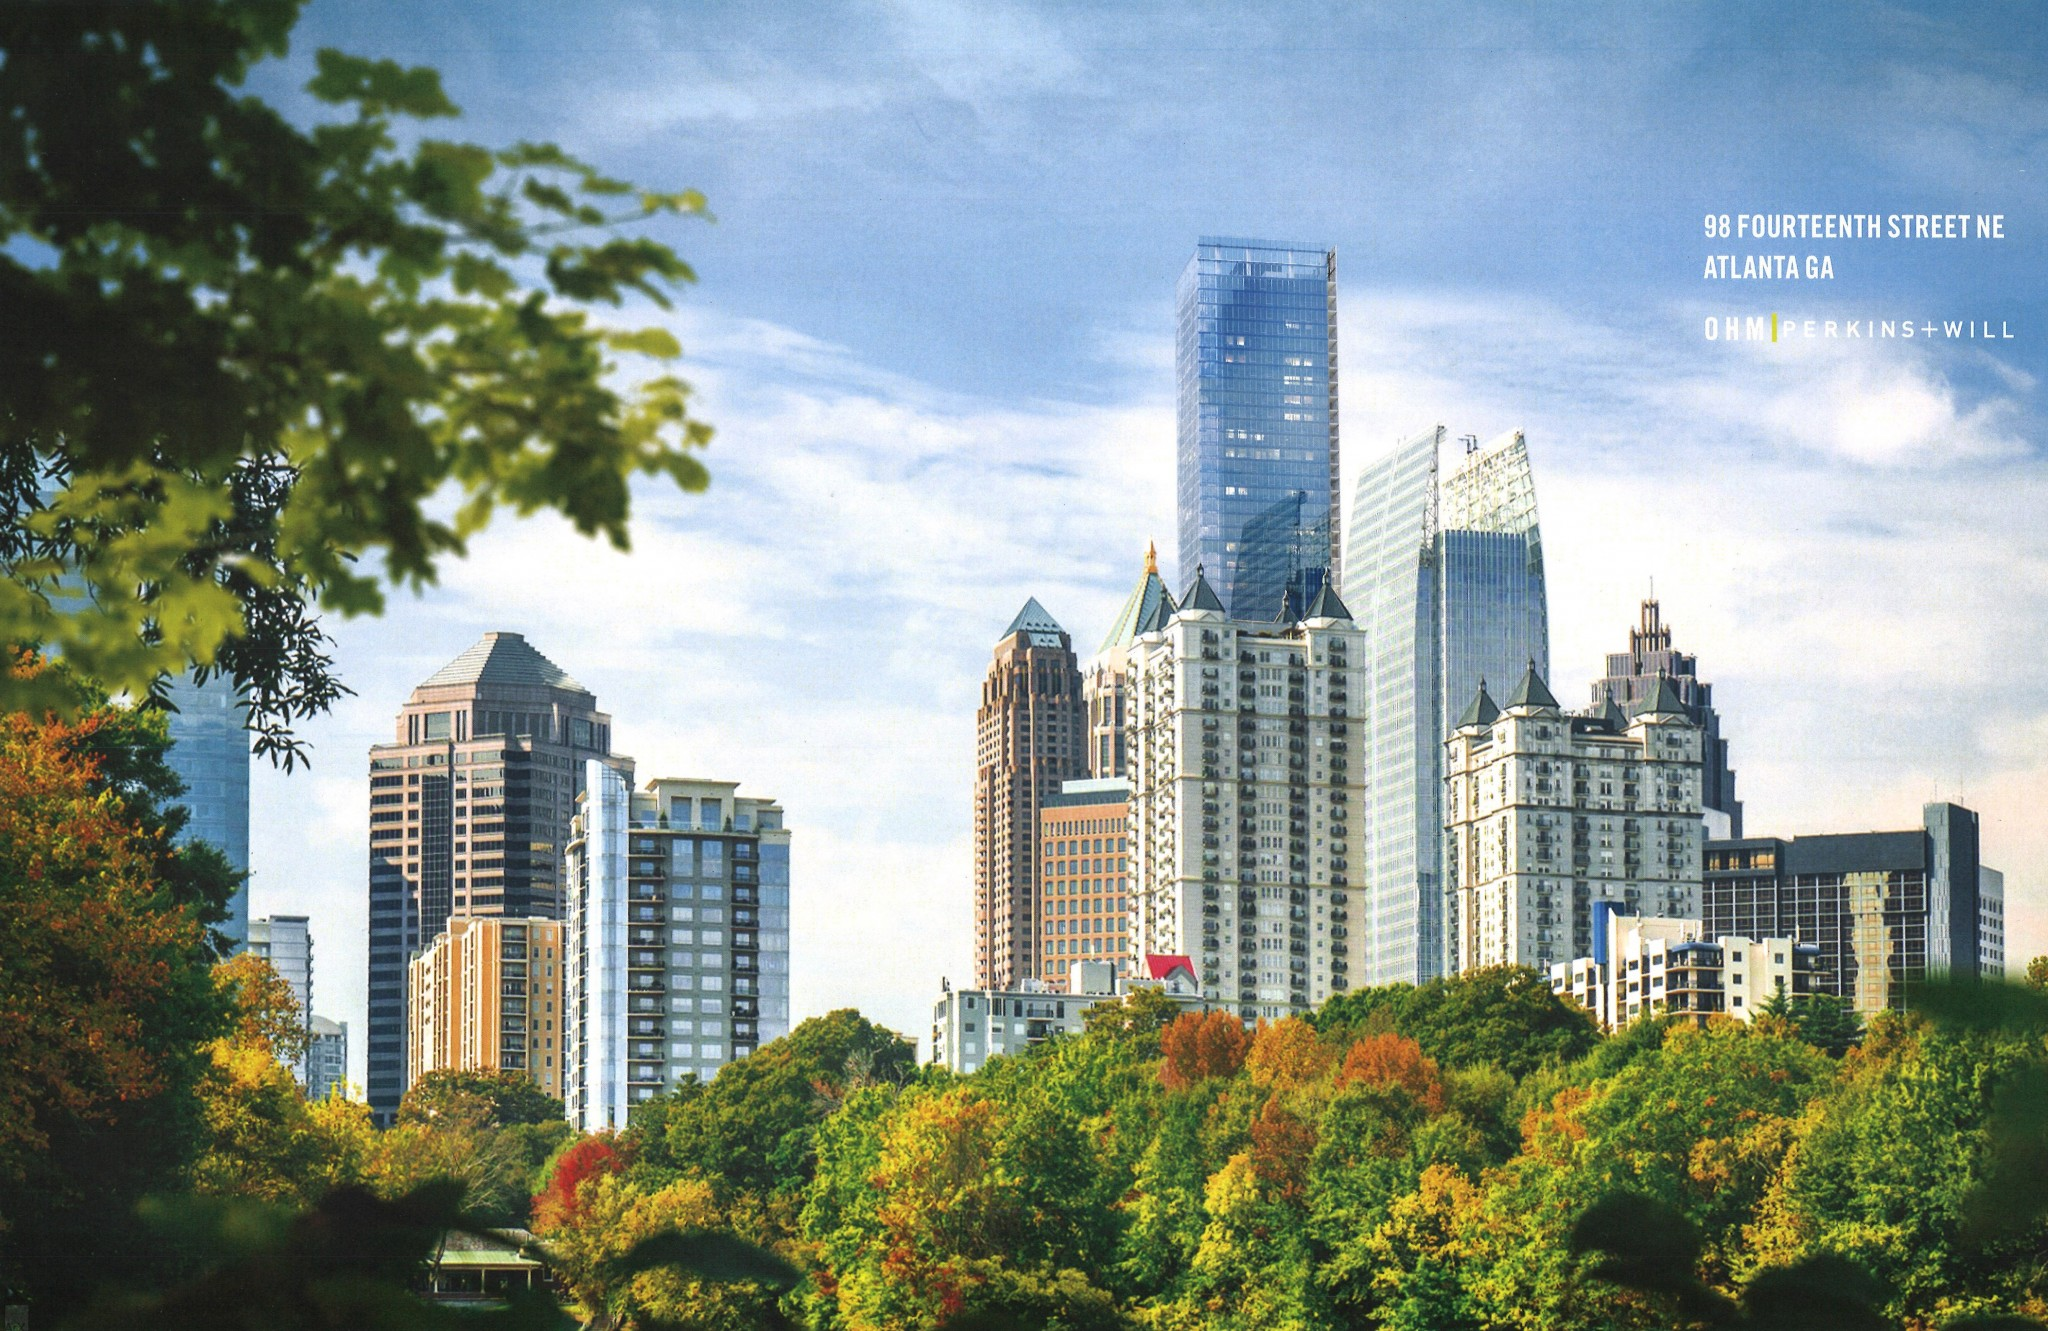 New Midtown Skyscraper Coming To Atlanta 98 Fourteenth